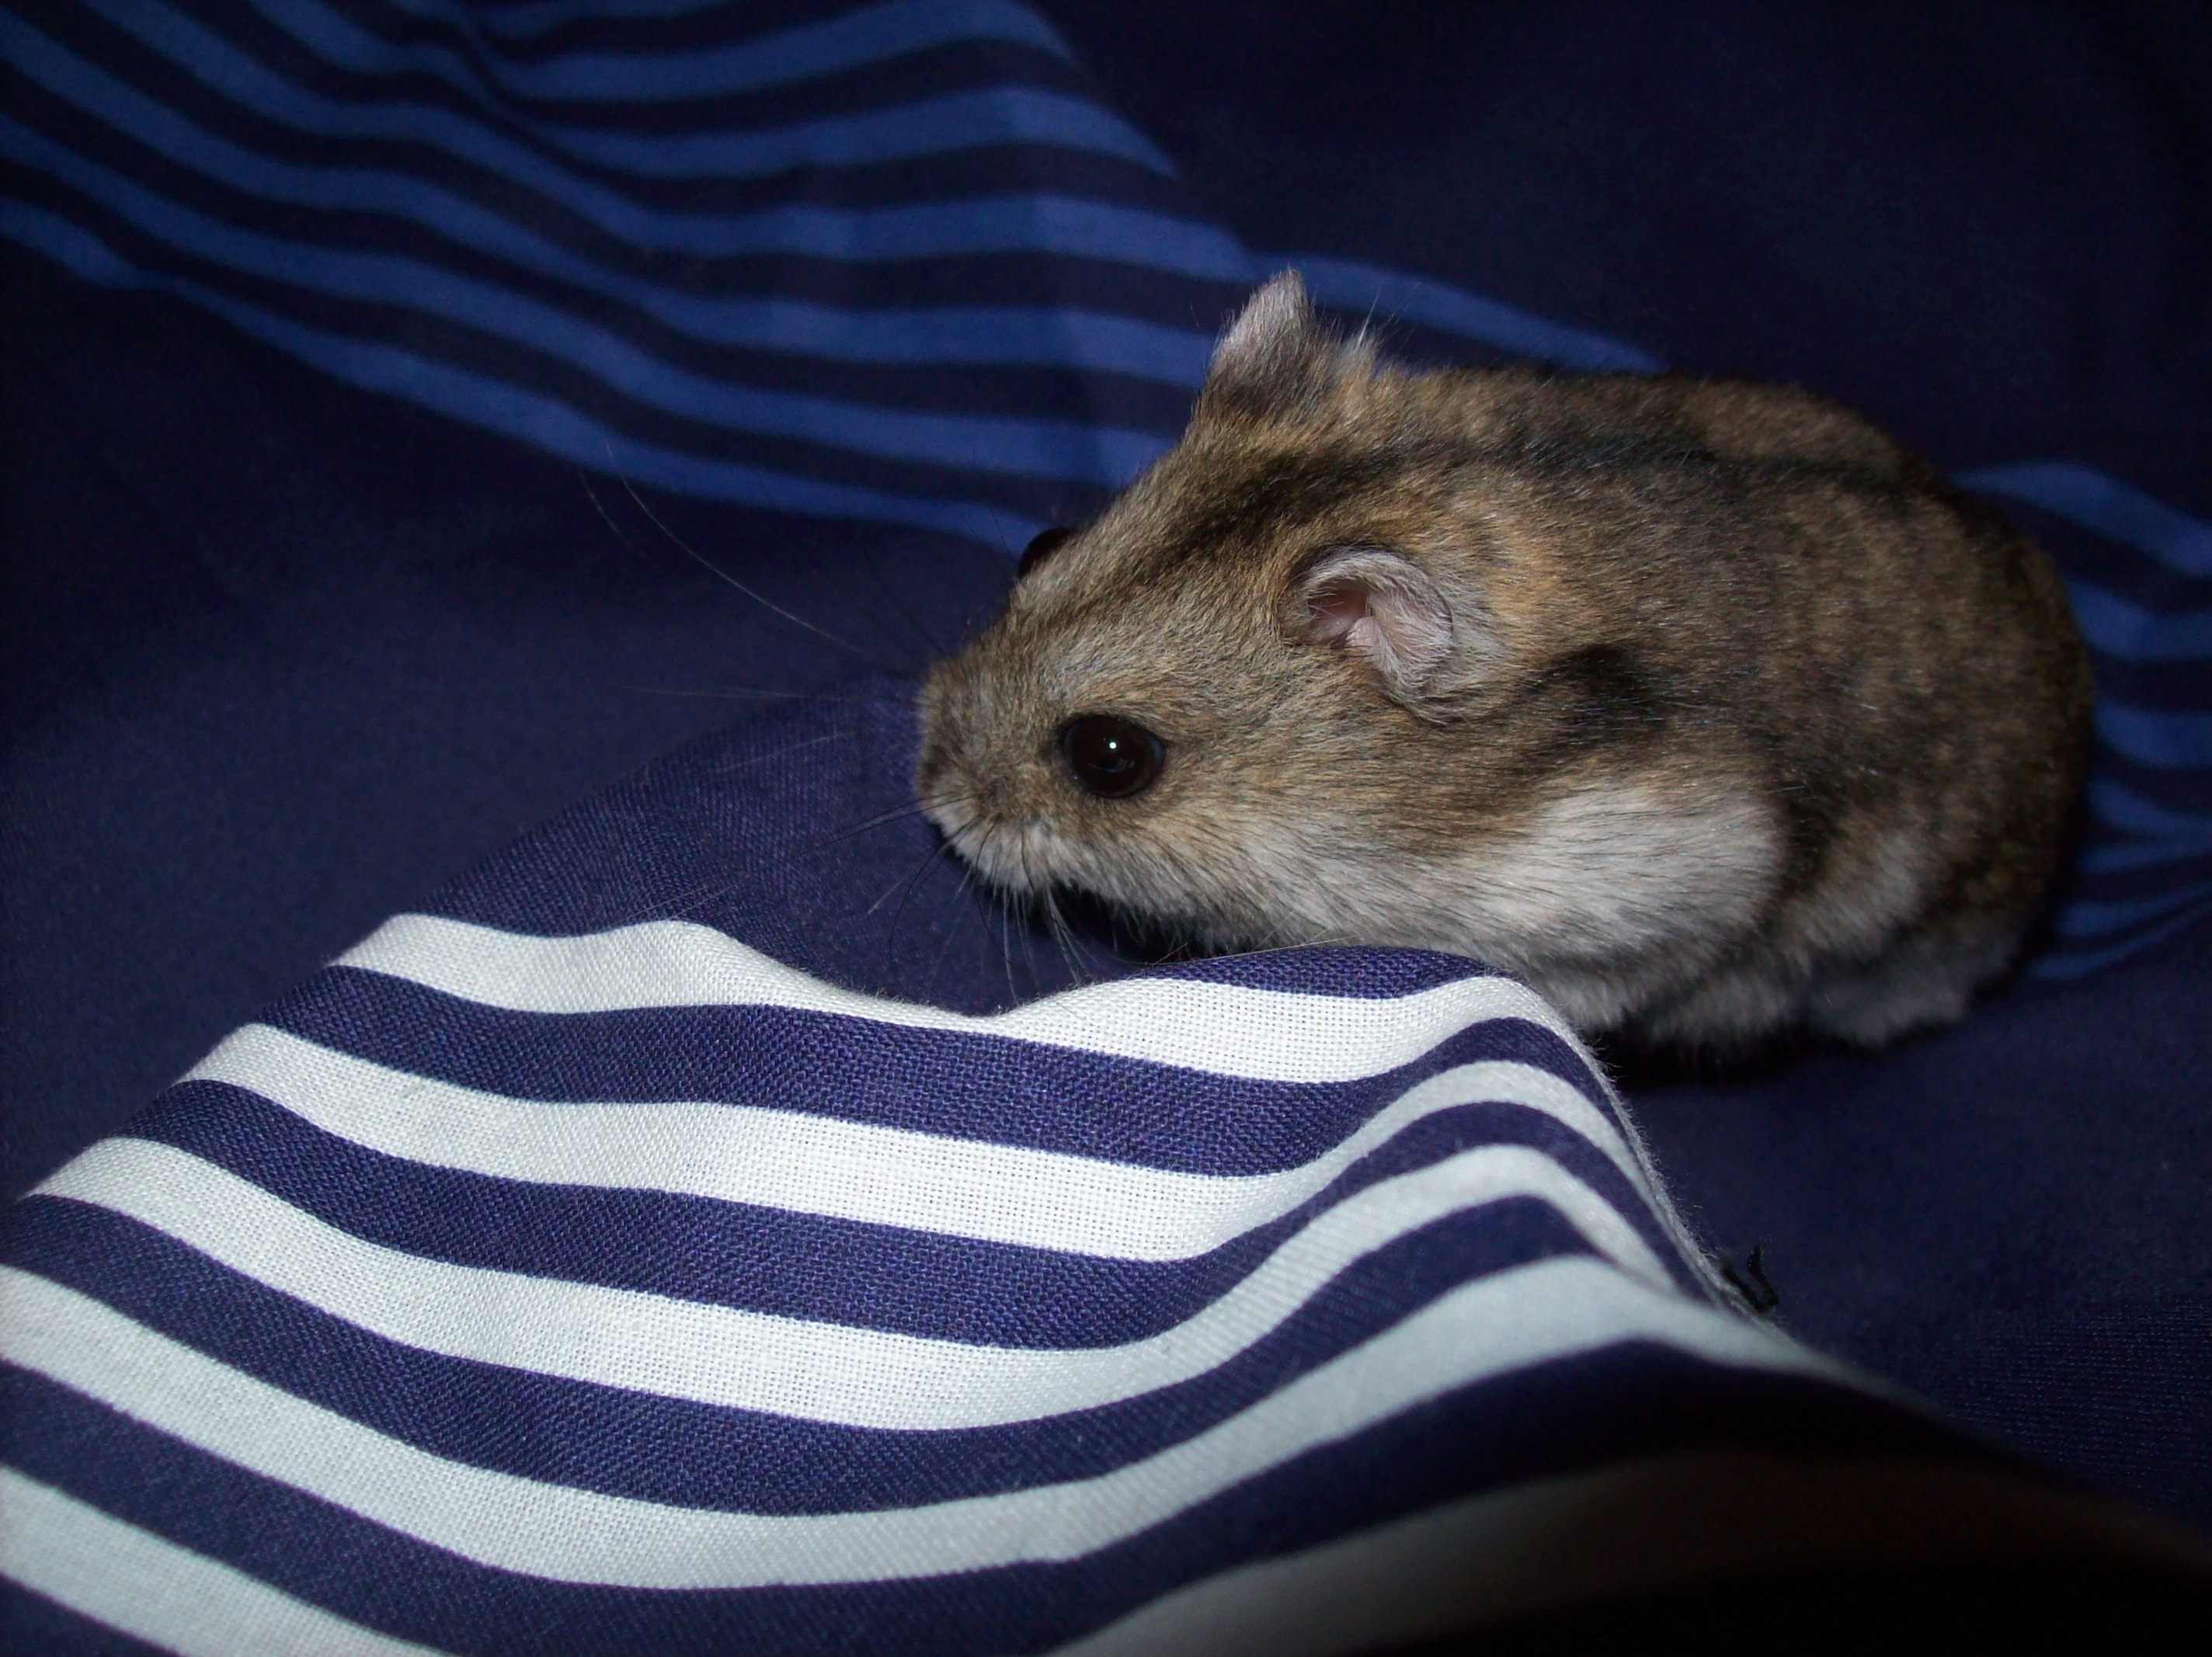 File:Dwarf campbell hamster male 2012 jpg - Wikimedia Commons